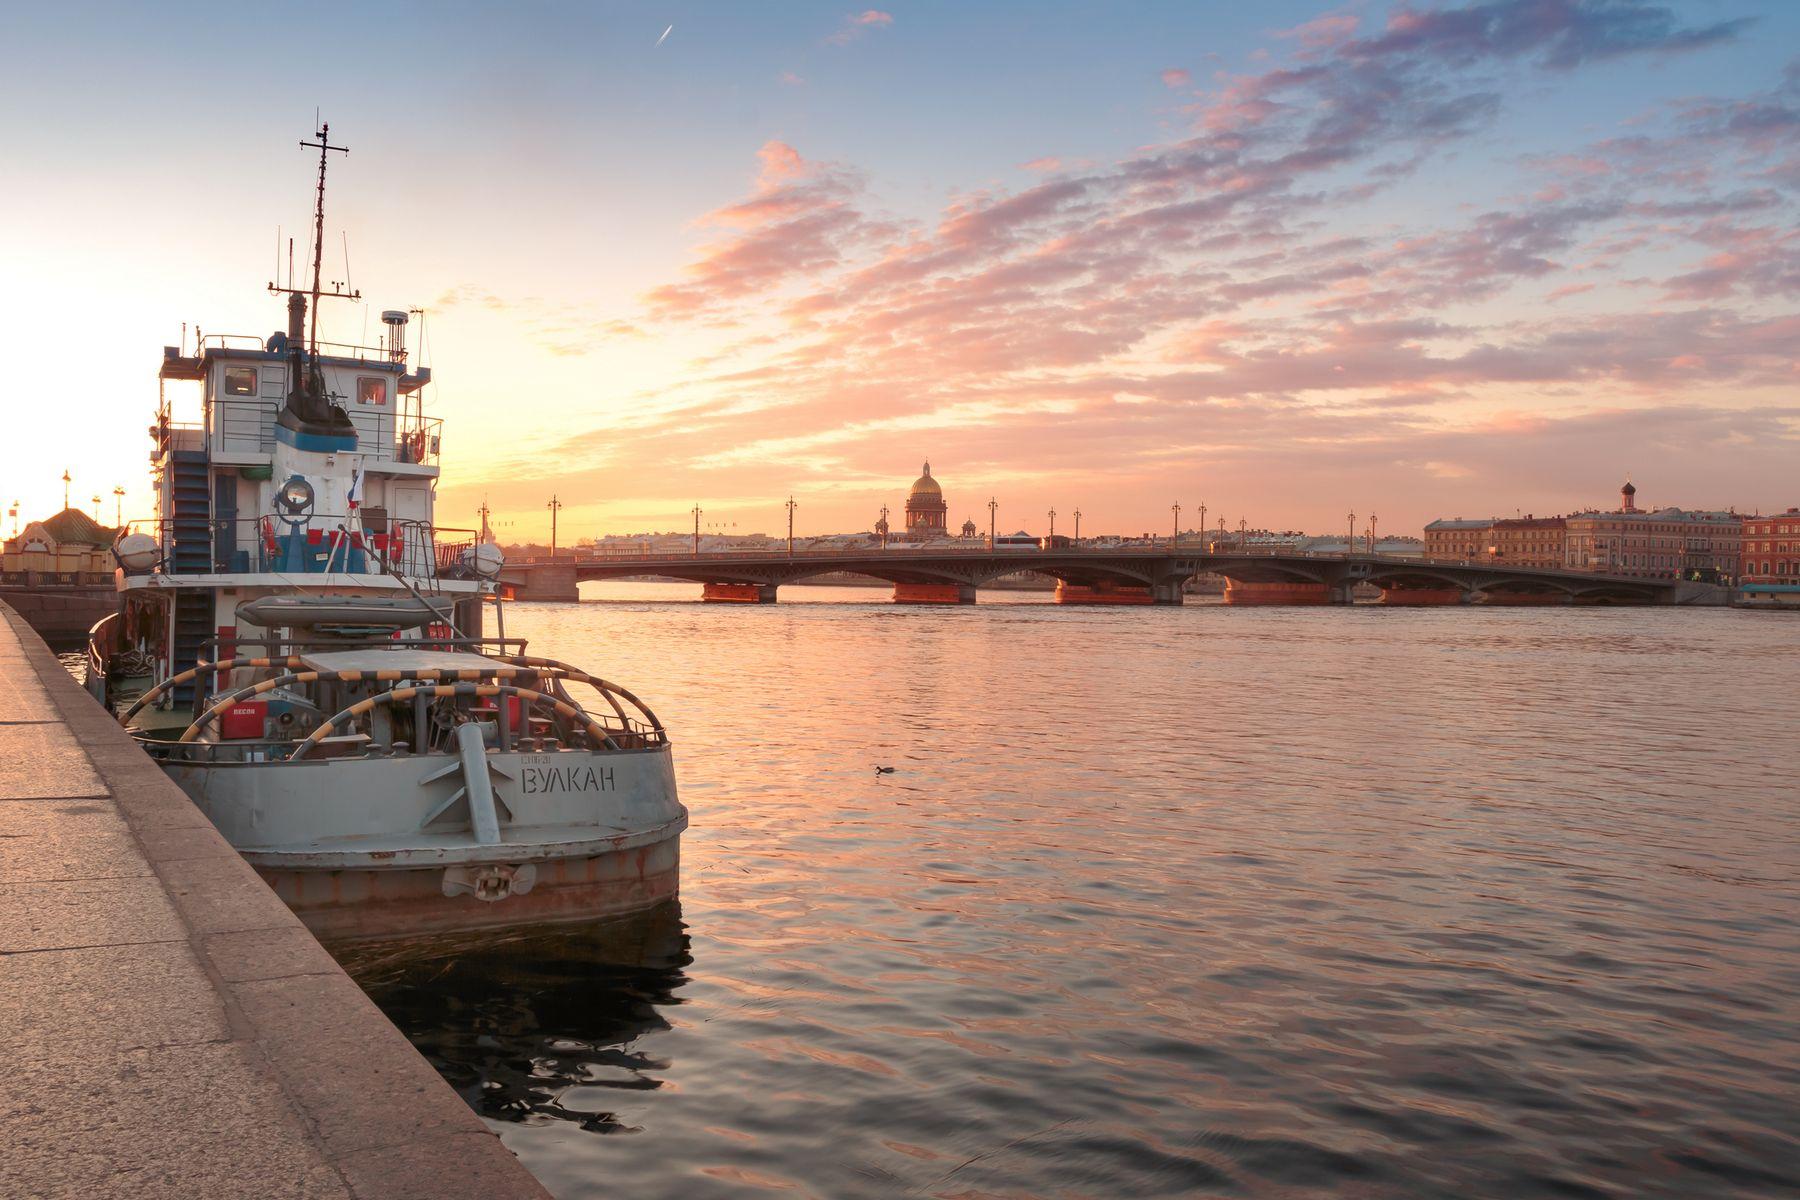 Утка и Вулкан Санкт-Петербург утро мост река отражение храм Нева